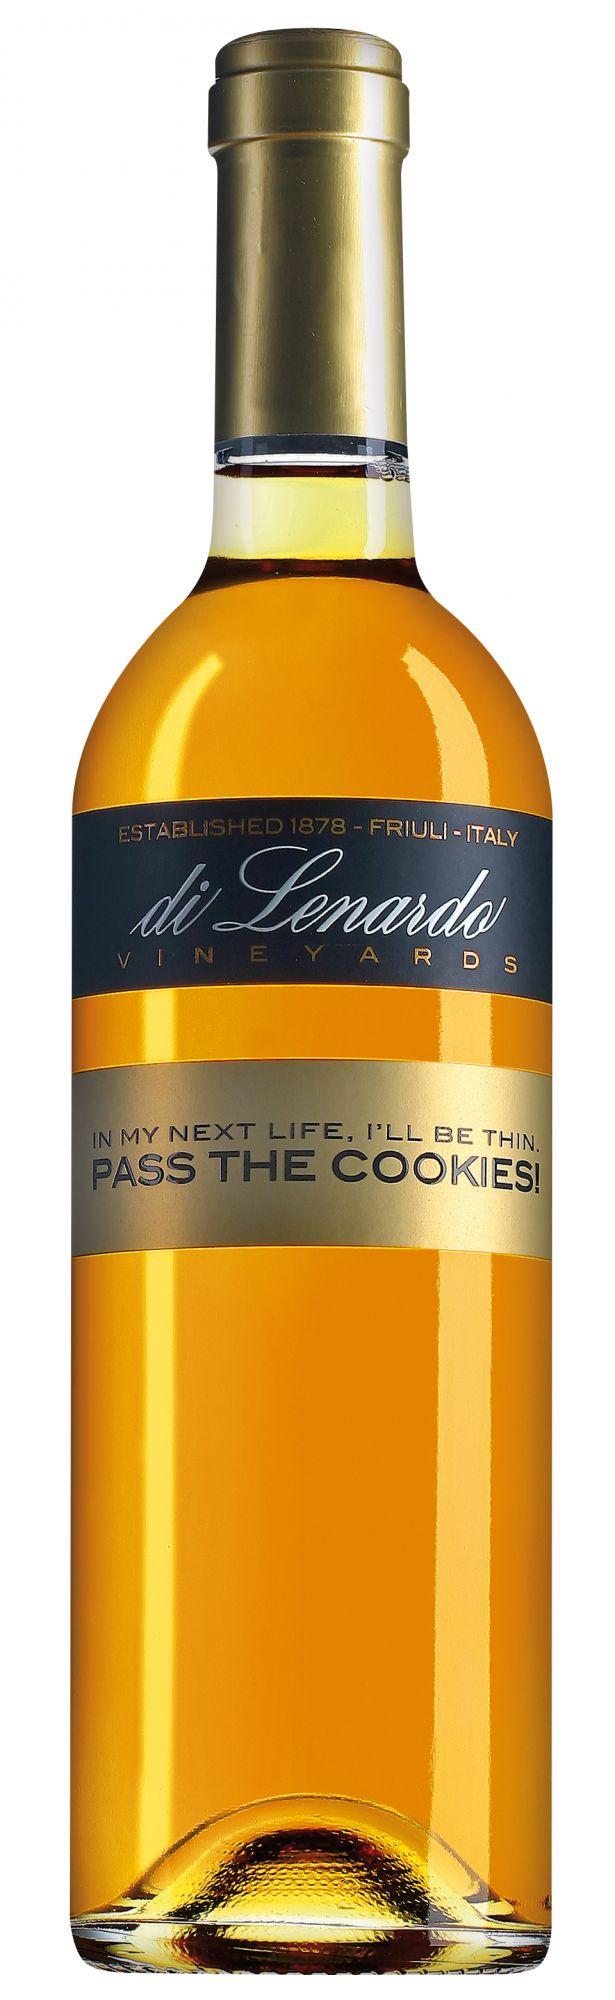 Di Lenardo Vineyards Venezia Giulia Pass the Cookies! Verduzzo unoaked